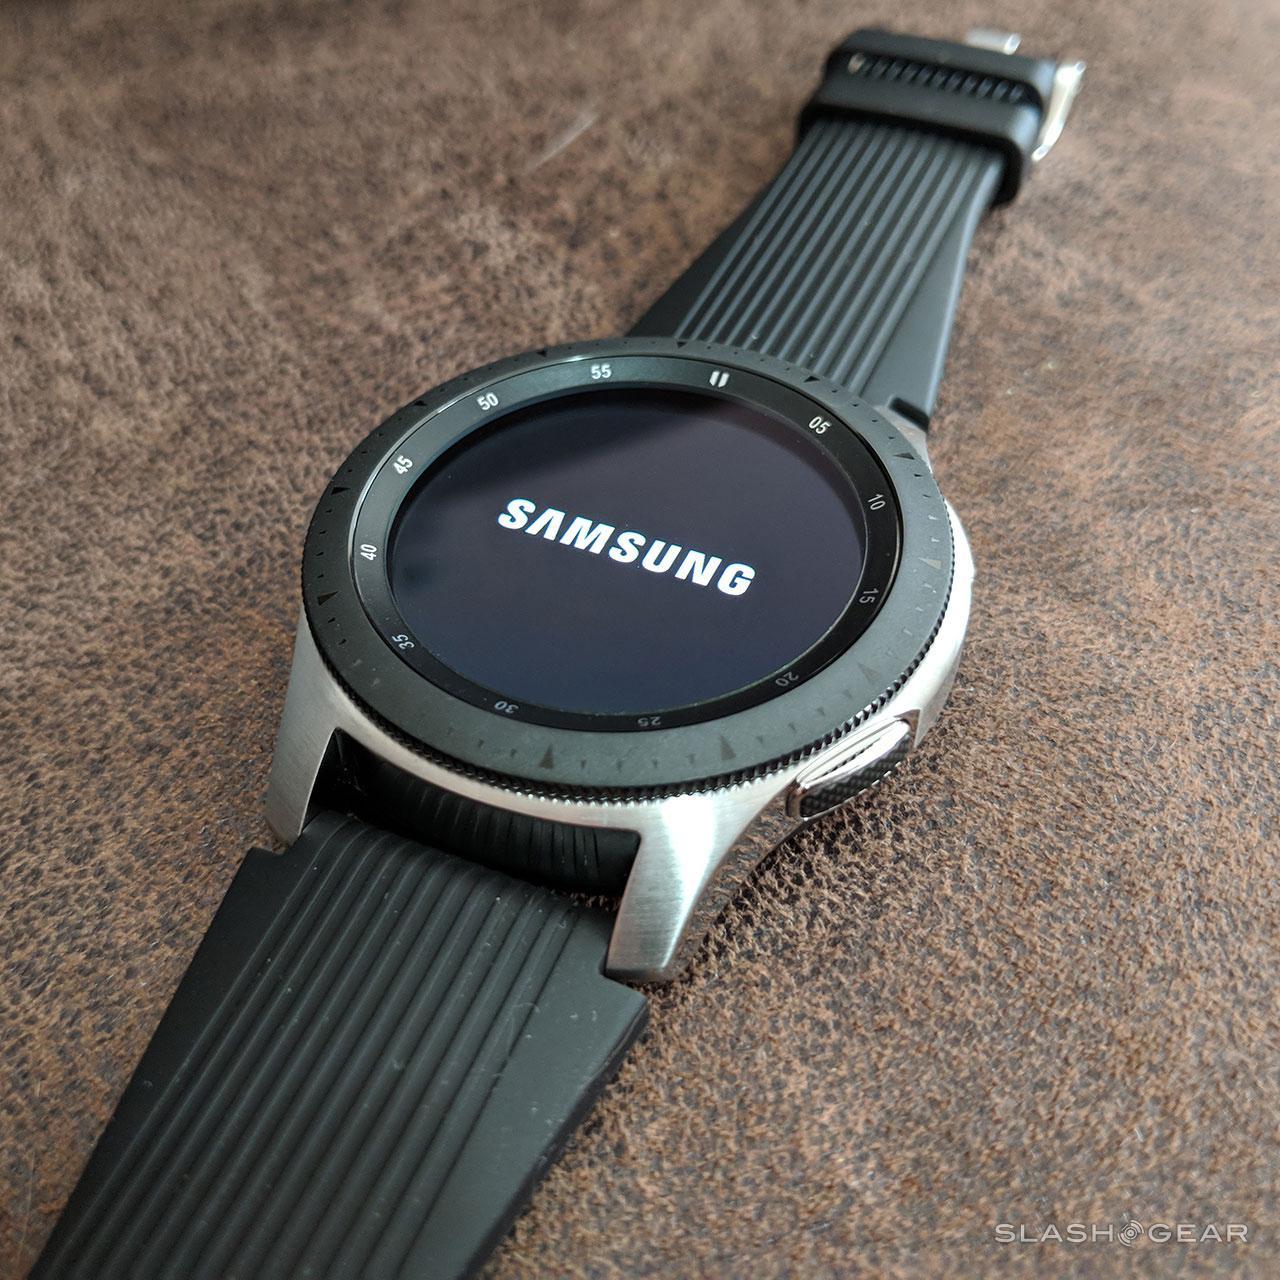 Samsung Galaxy Watch Review: Just Right - SlashGear